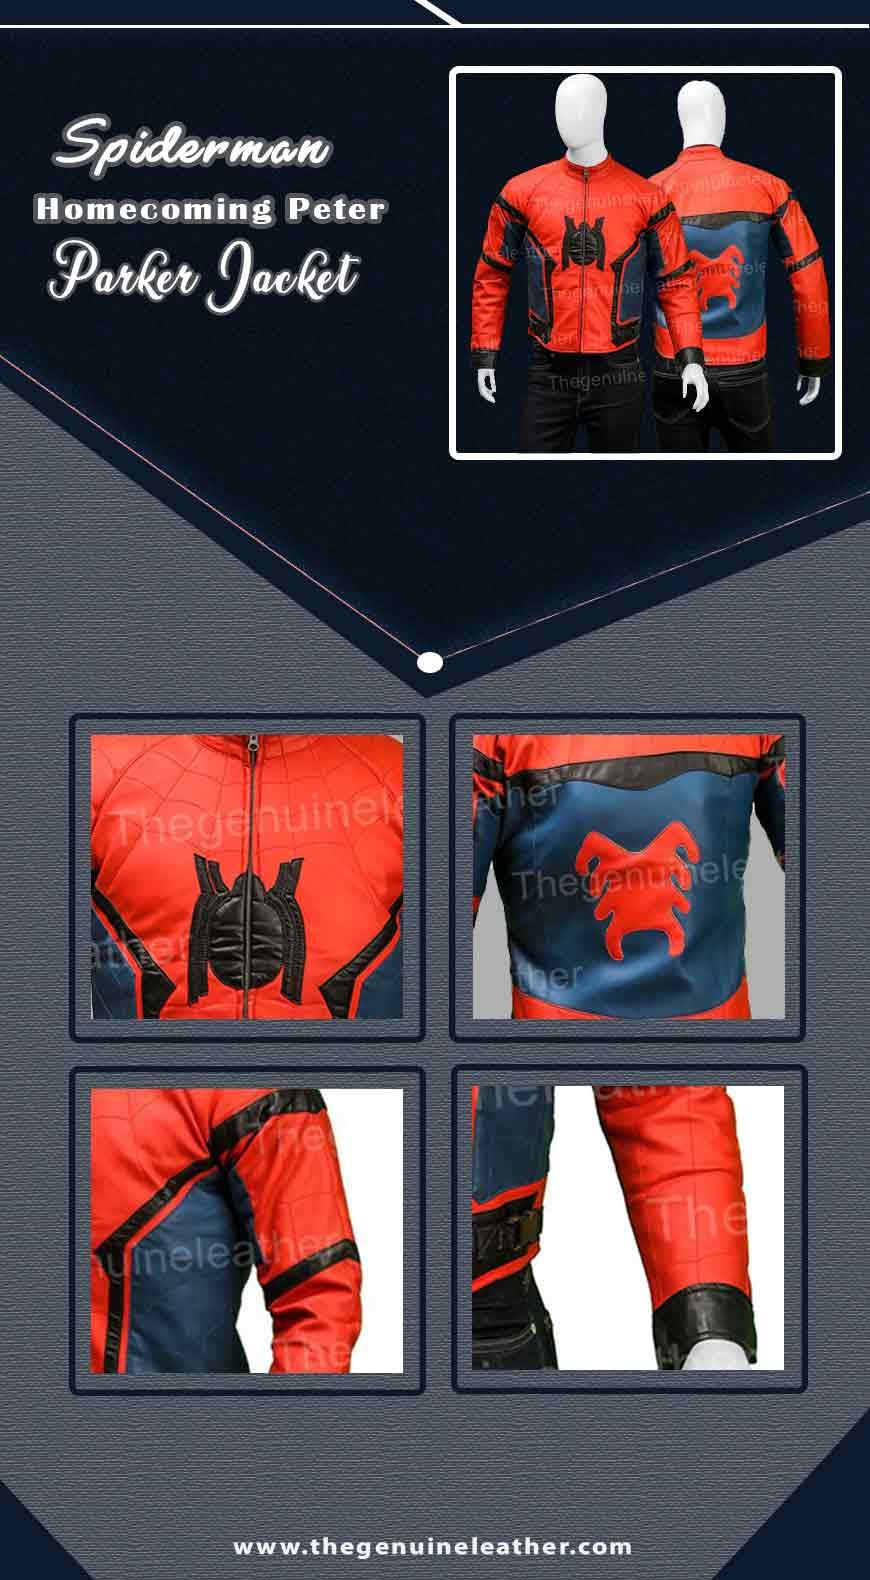 Spiderman Homecoming Peter Parker Jacket